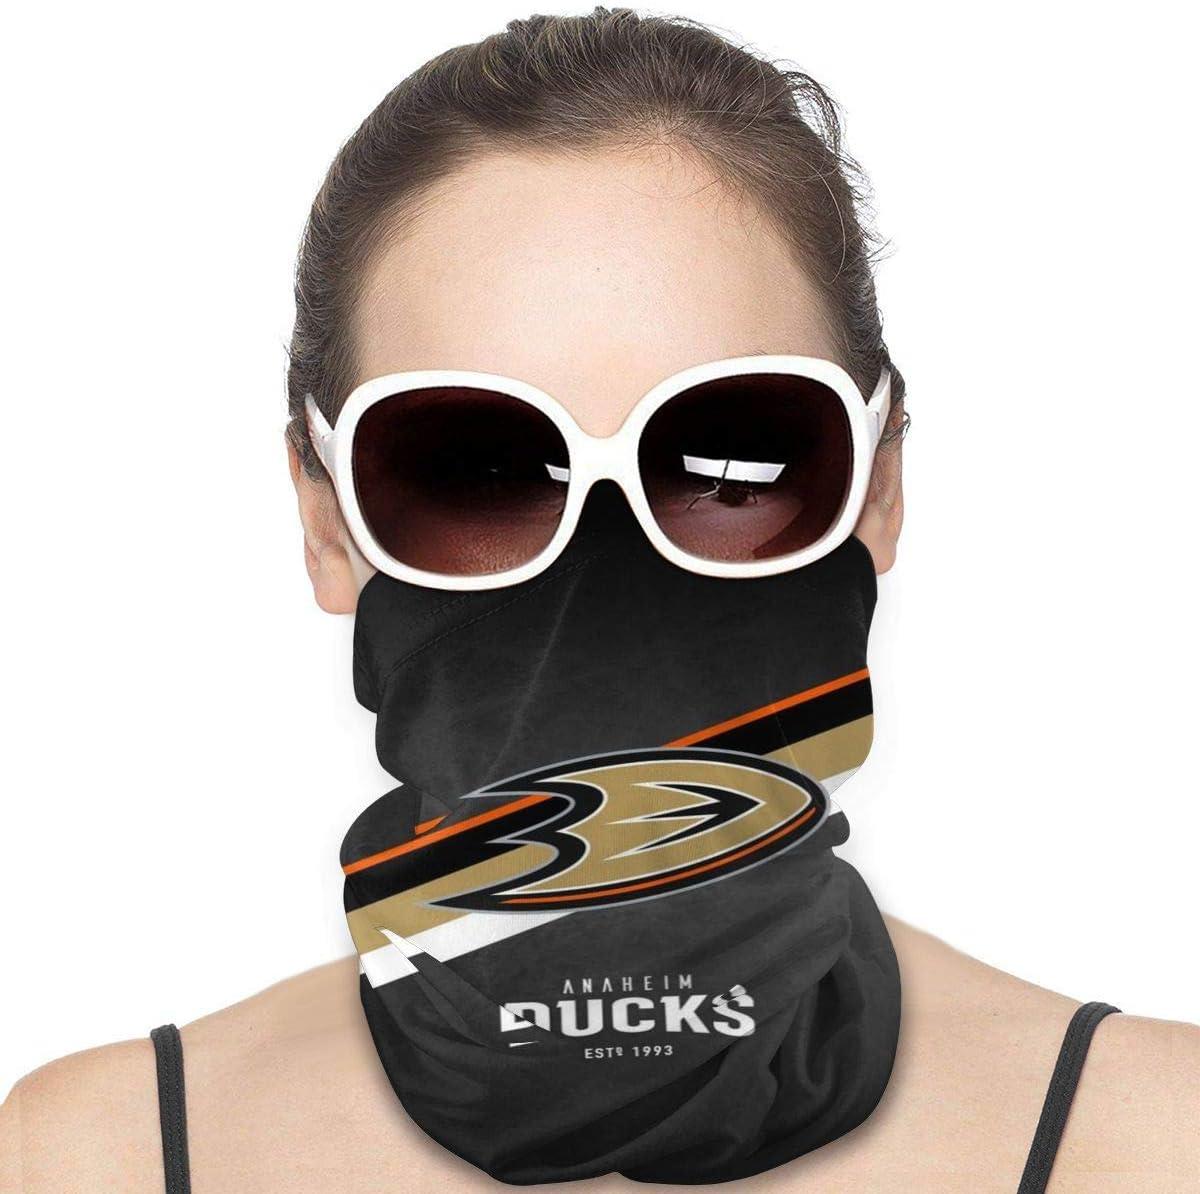 ZZAJJA Anaheim-Ducks Light And Breathablesports fashion/Unisex/Multifunctiona/Scarf/Sports/Sun/protection/Bandanas/Neck/Gaiter